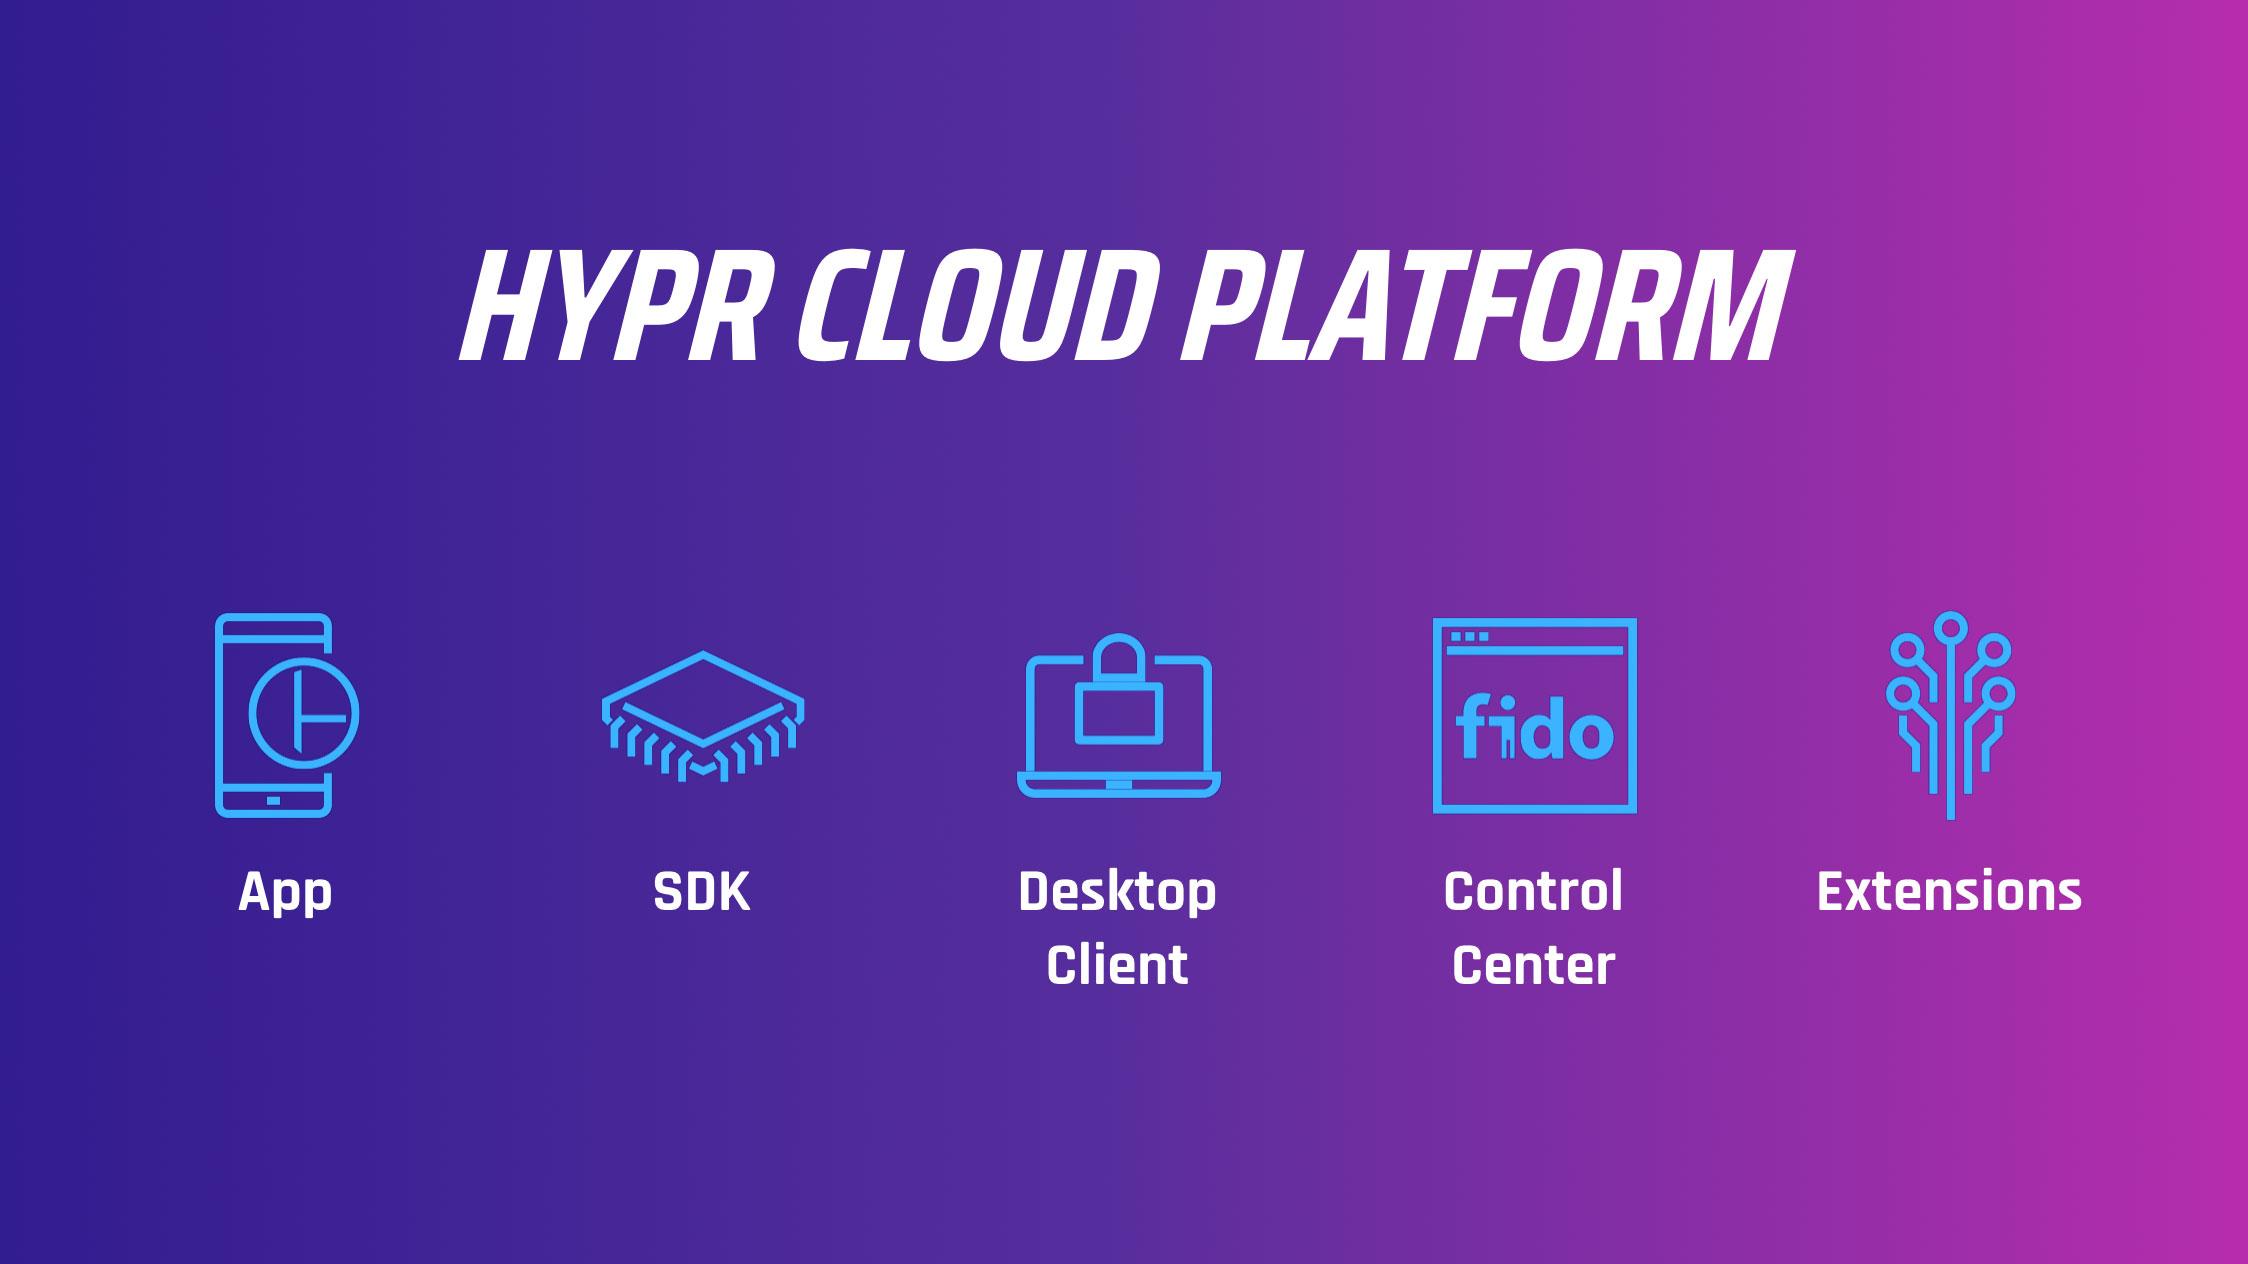 HYPR Cloud Platform 6.7 Release